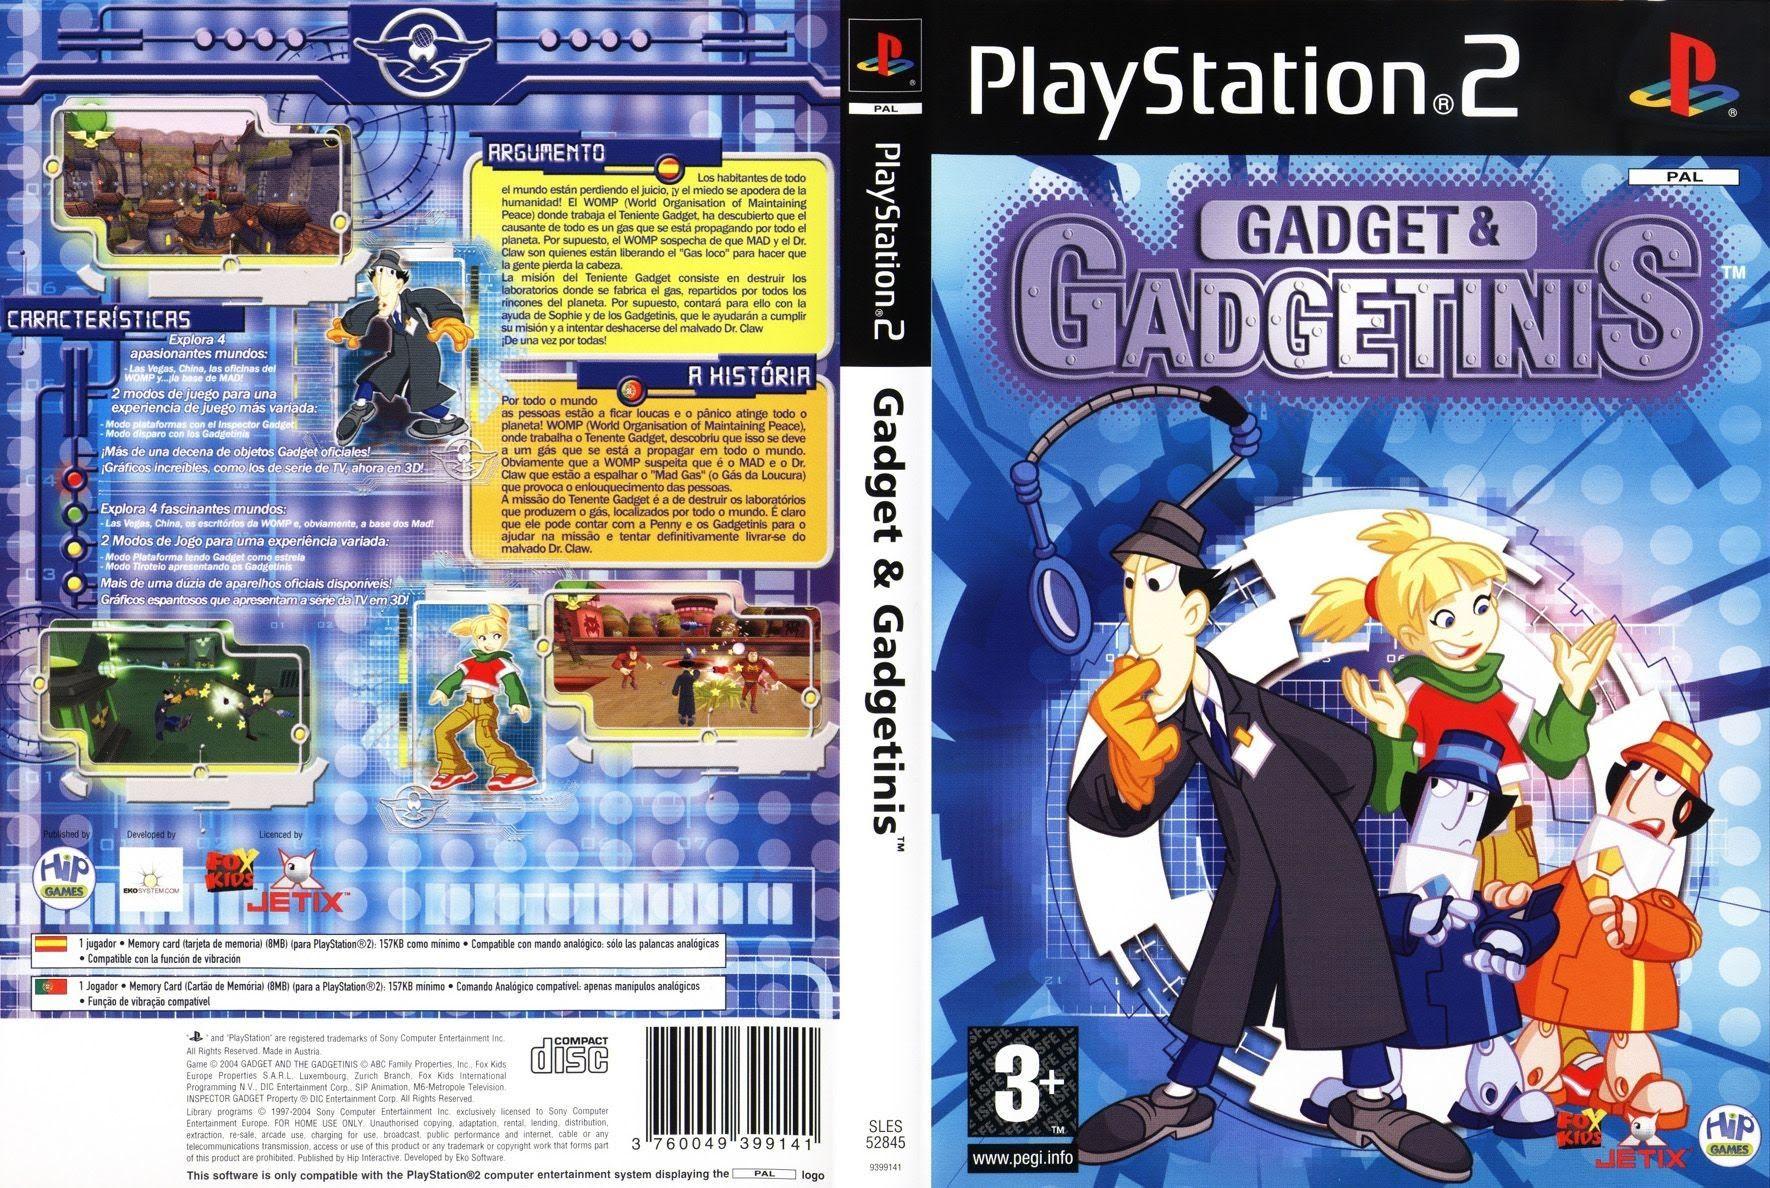 Gadget & the gadgetinis PS2 Walkthrough/lets play part 1